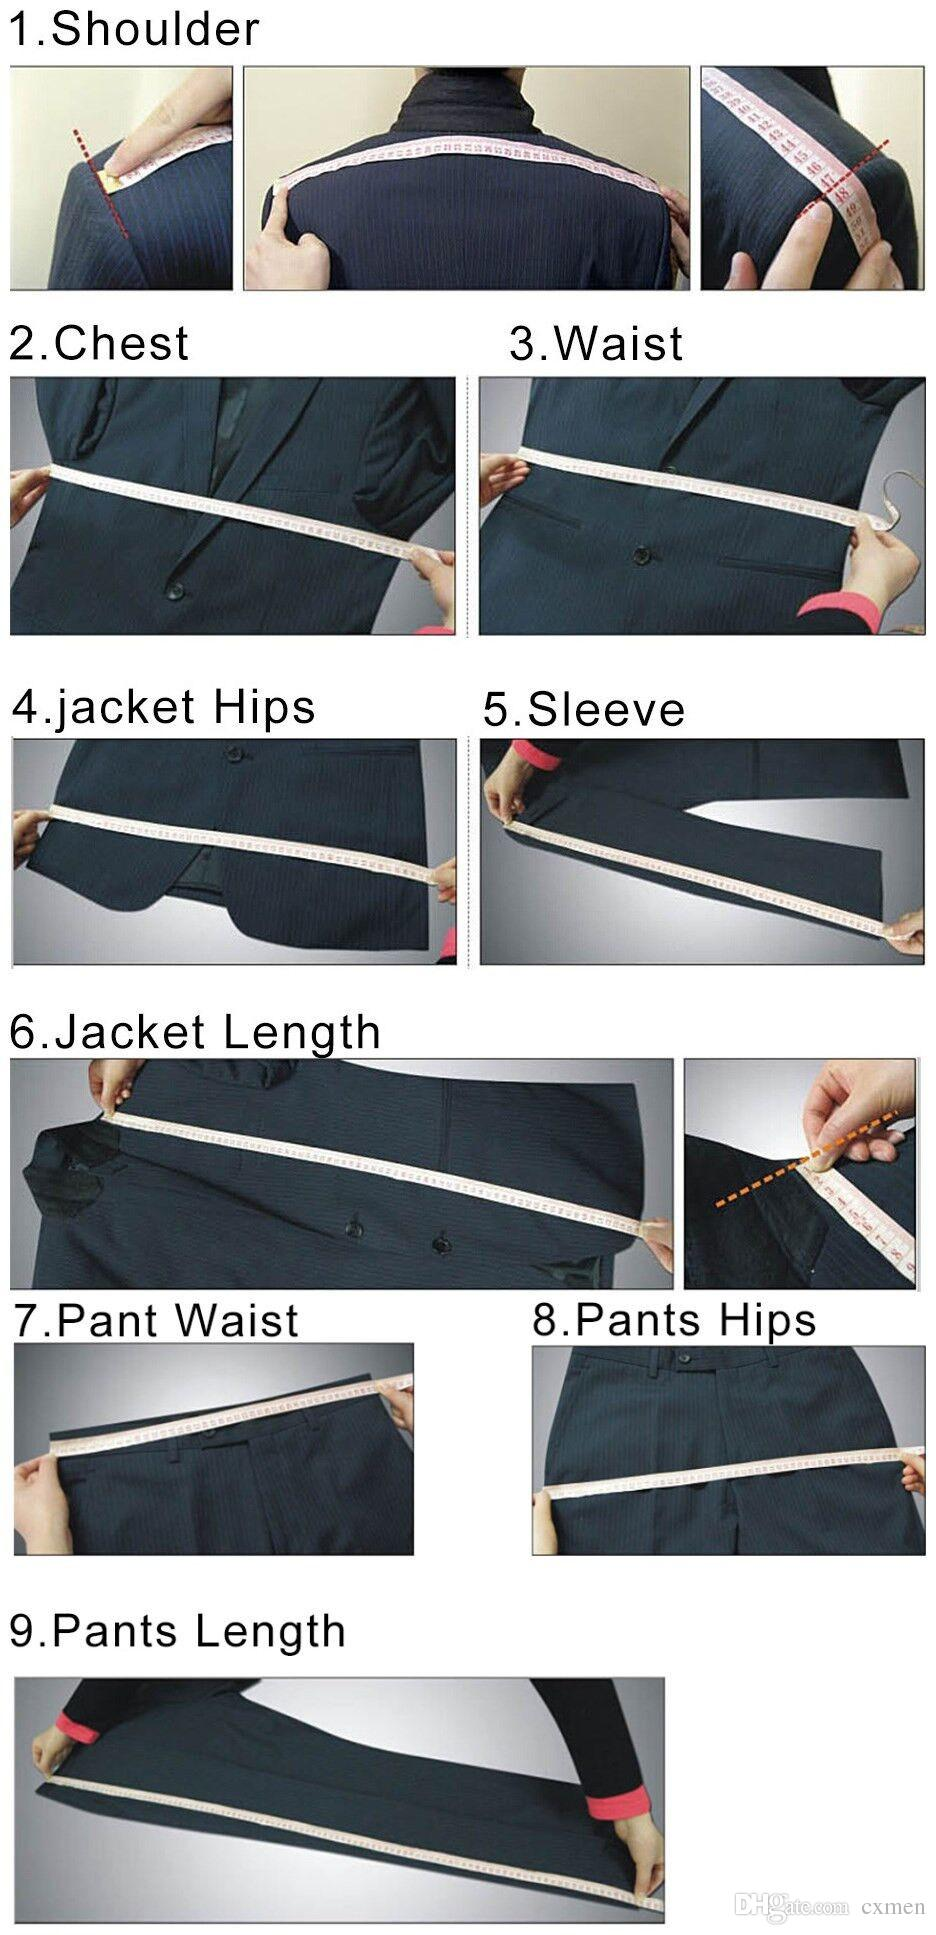 Black Shawl Lapel Custom White Men Suits 2018 Wedding Groom Tuxedos Groomsman Suits Best Man Prom Wear Slim Blazer Jacket+Pants